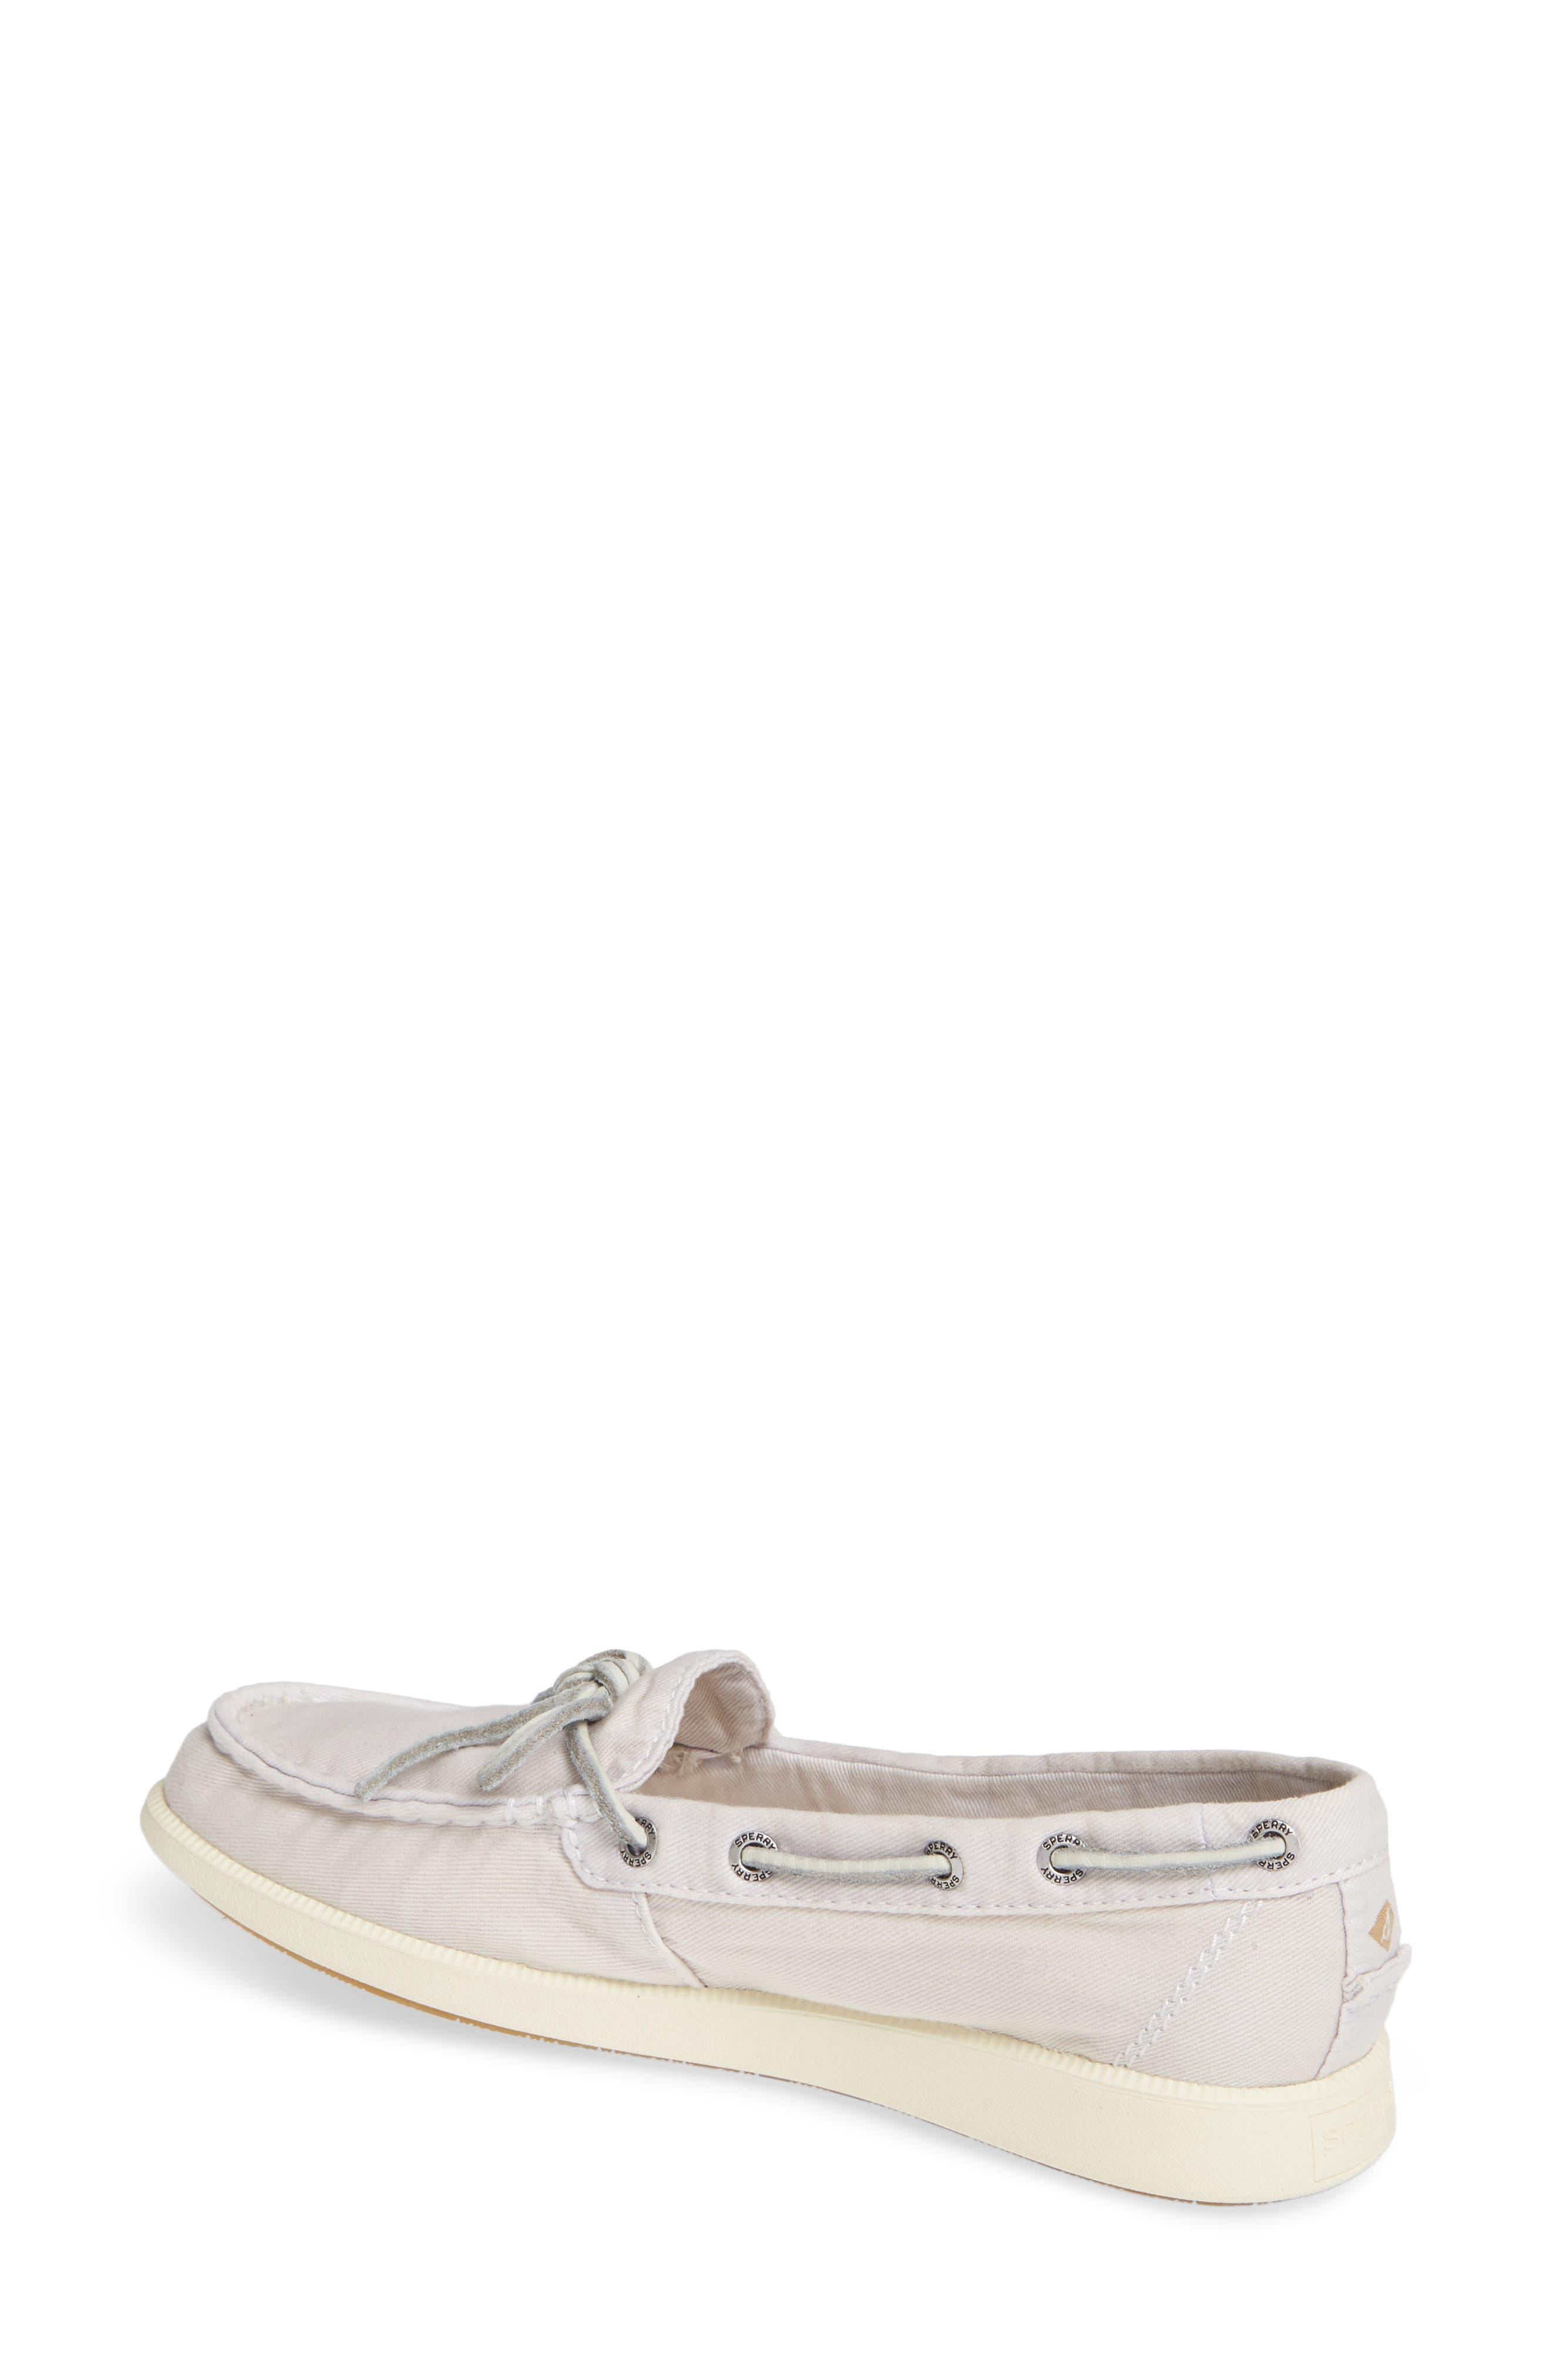 Oasis Boat Shoe,                             Alternate thumbnail 2, color,                             Ivory Canvas